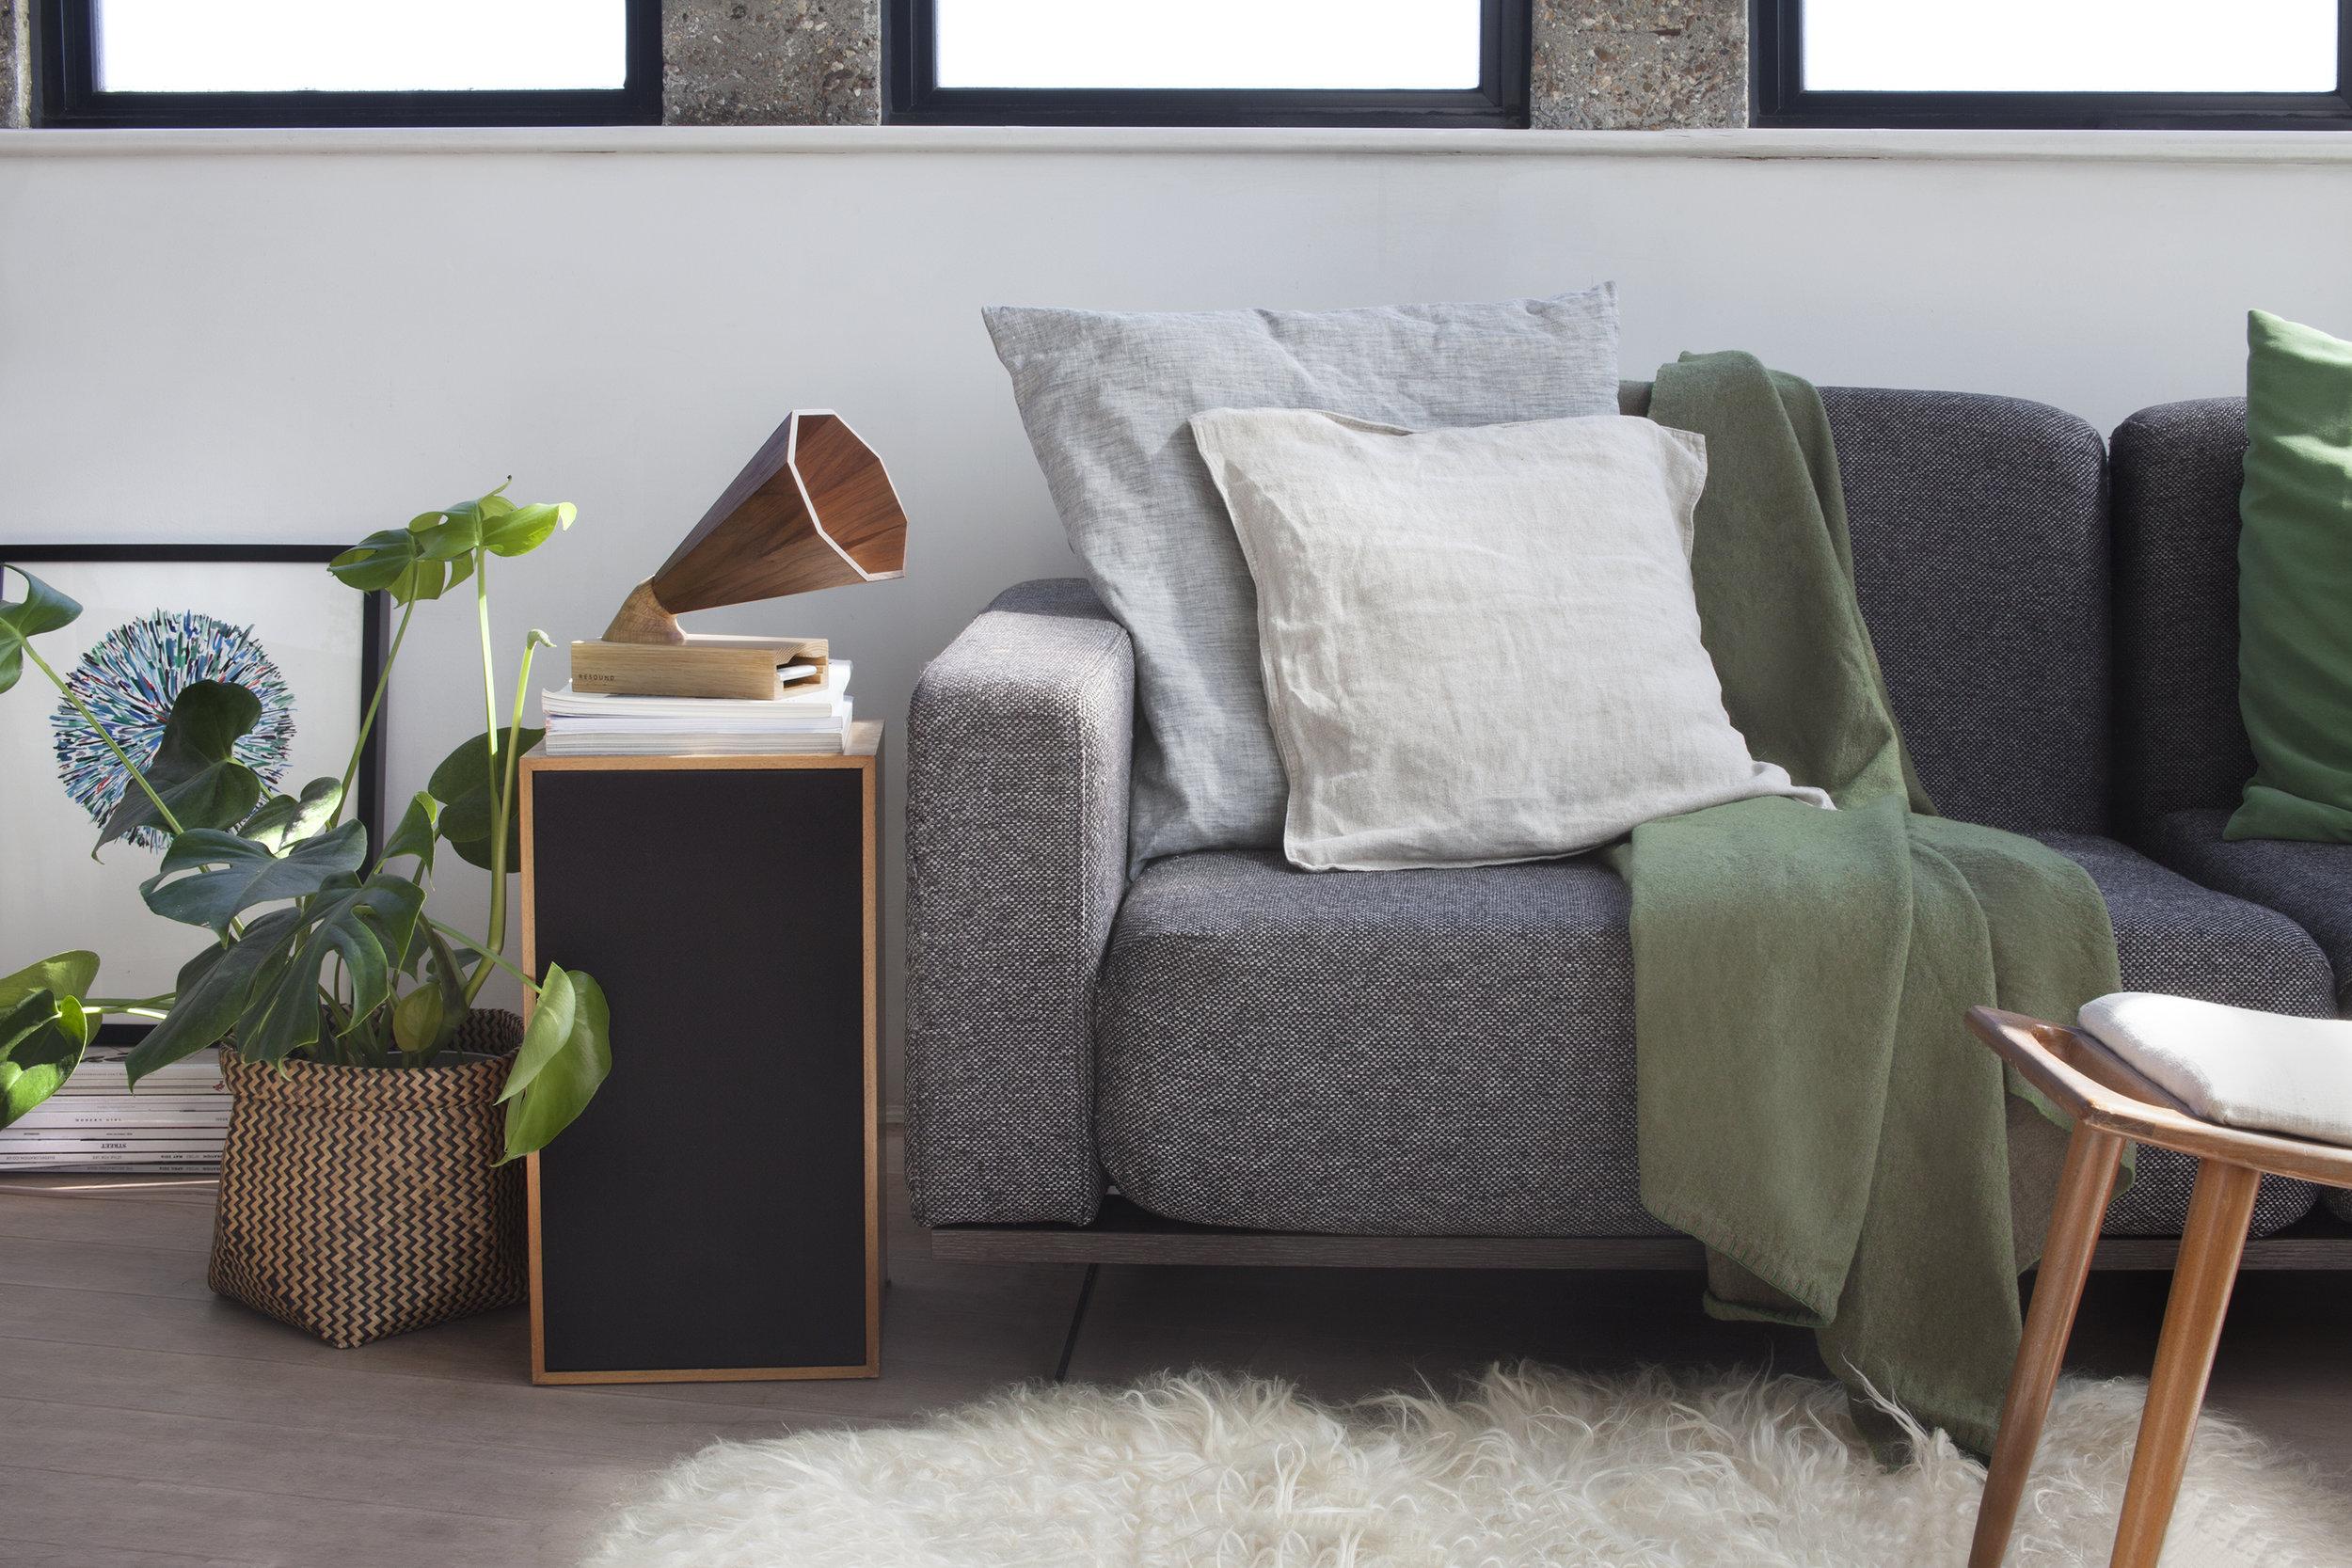 Wooden Sofa.jpg